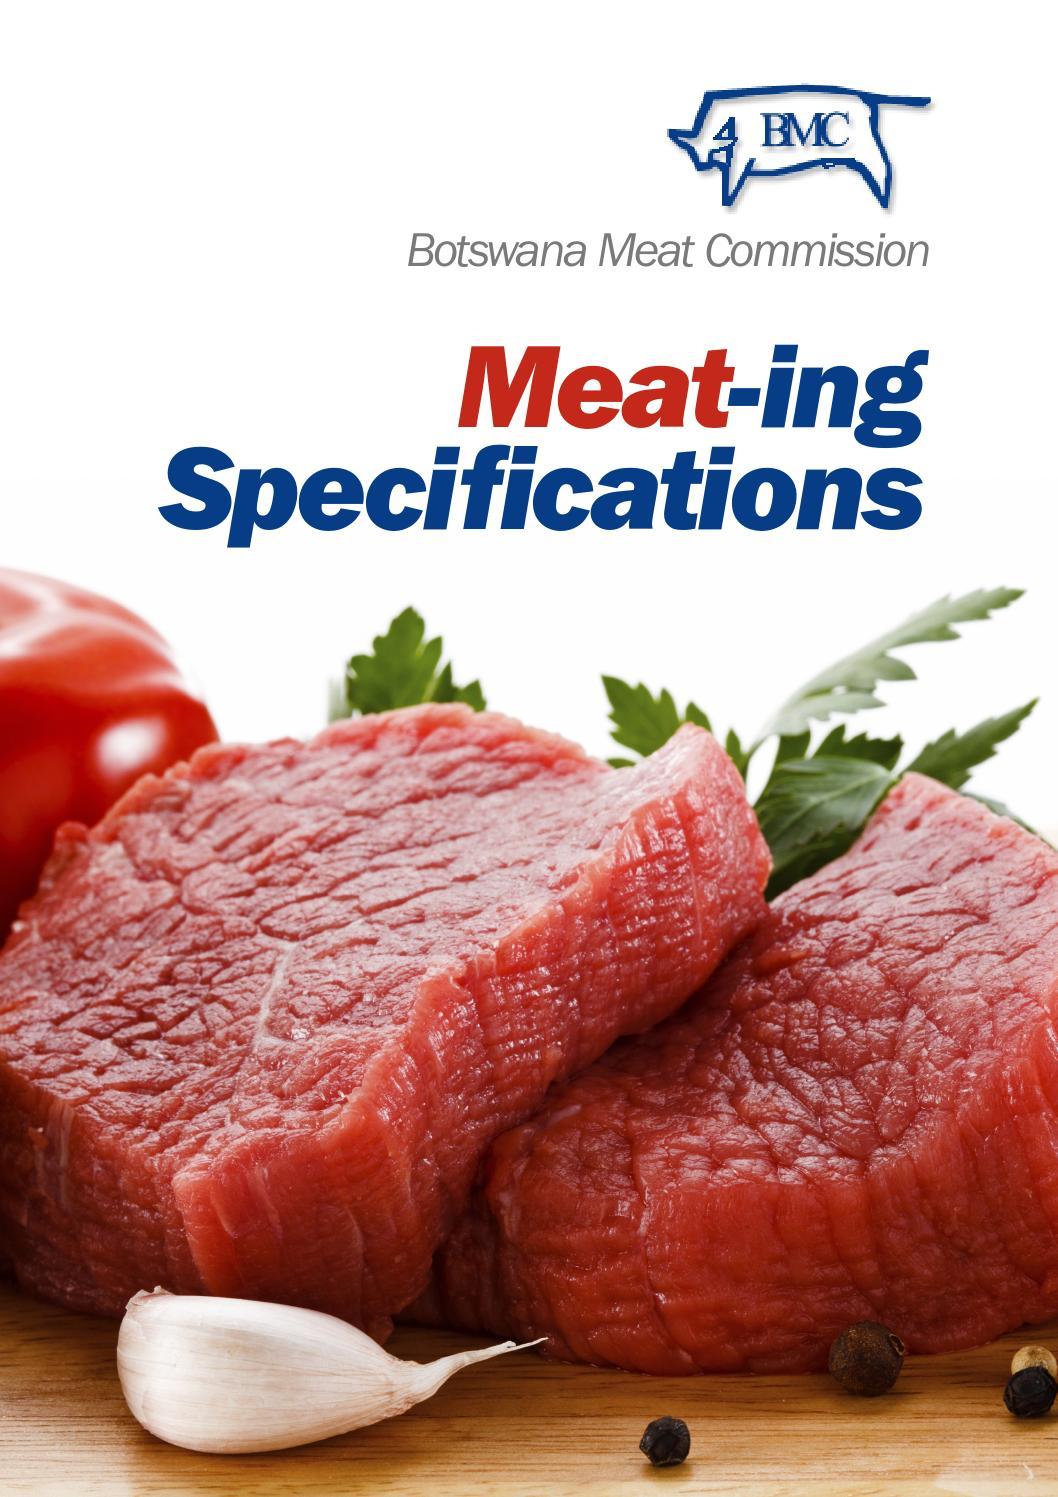 Botswana Meat Commission Brochure 2013 By Fdf World Issuu